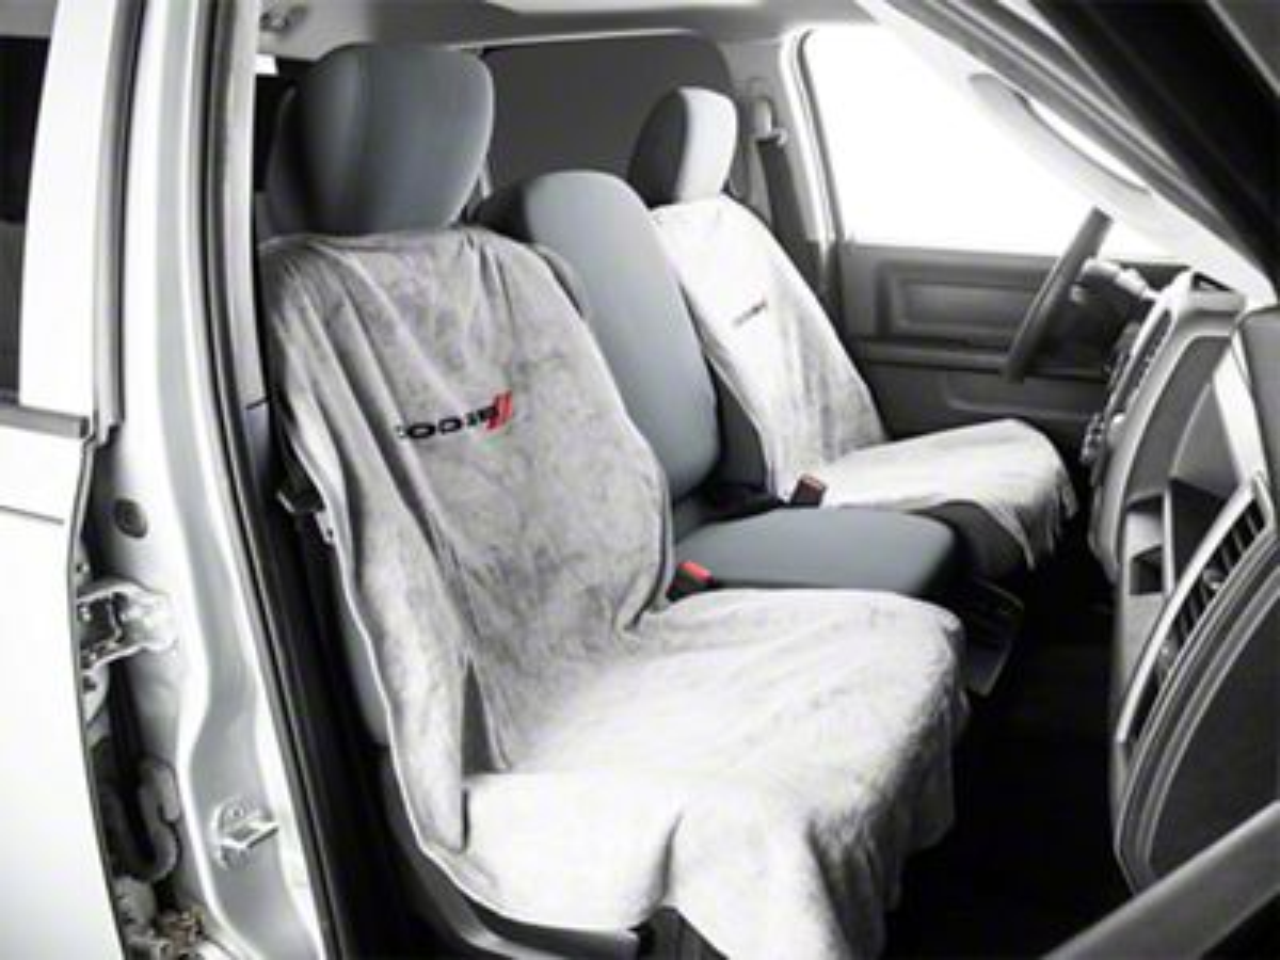 Seat Protector w/ Dodge Logo - Gray (02-19 RAM 1500)